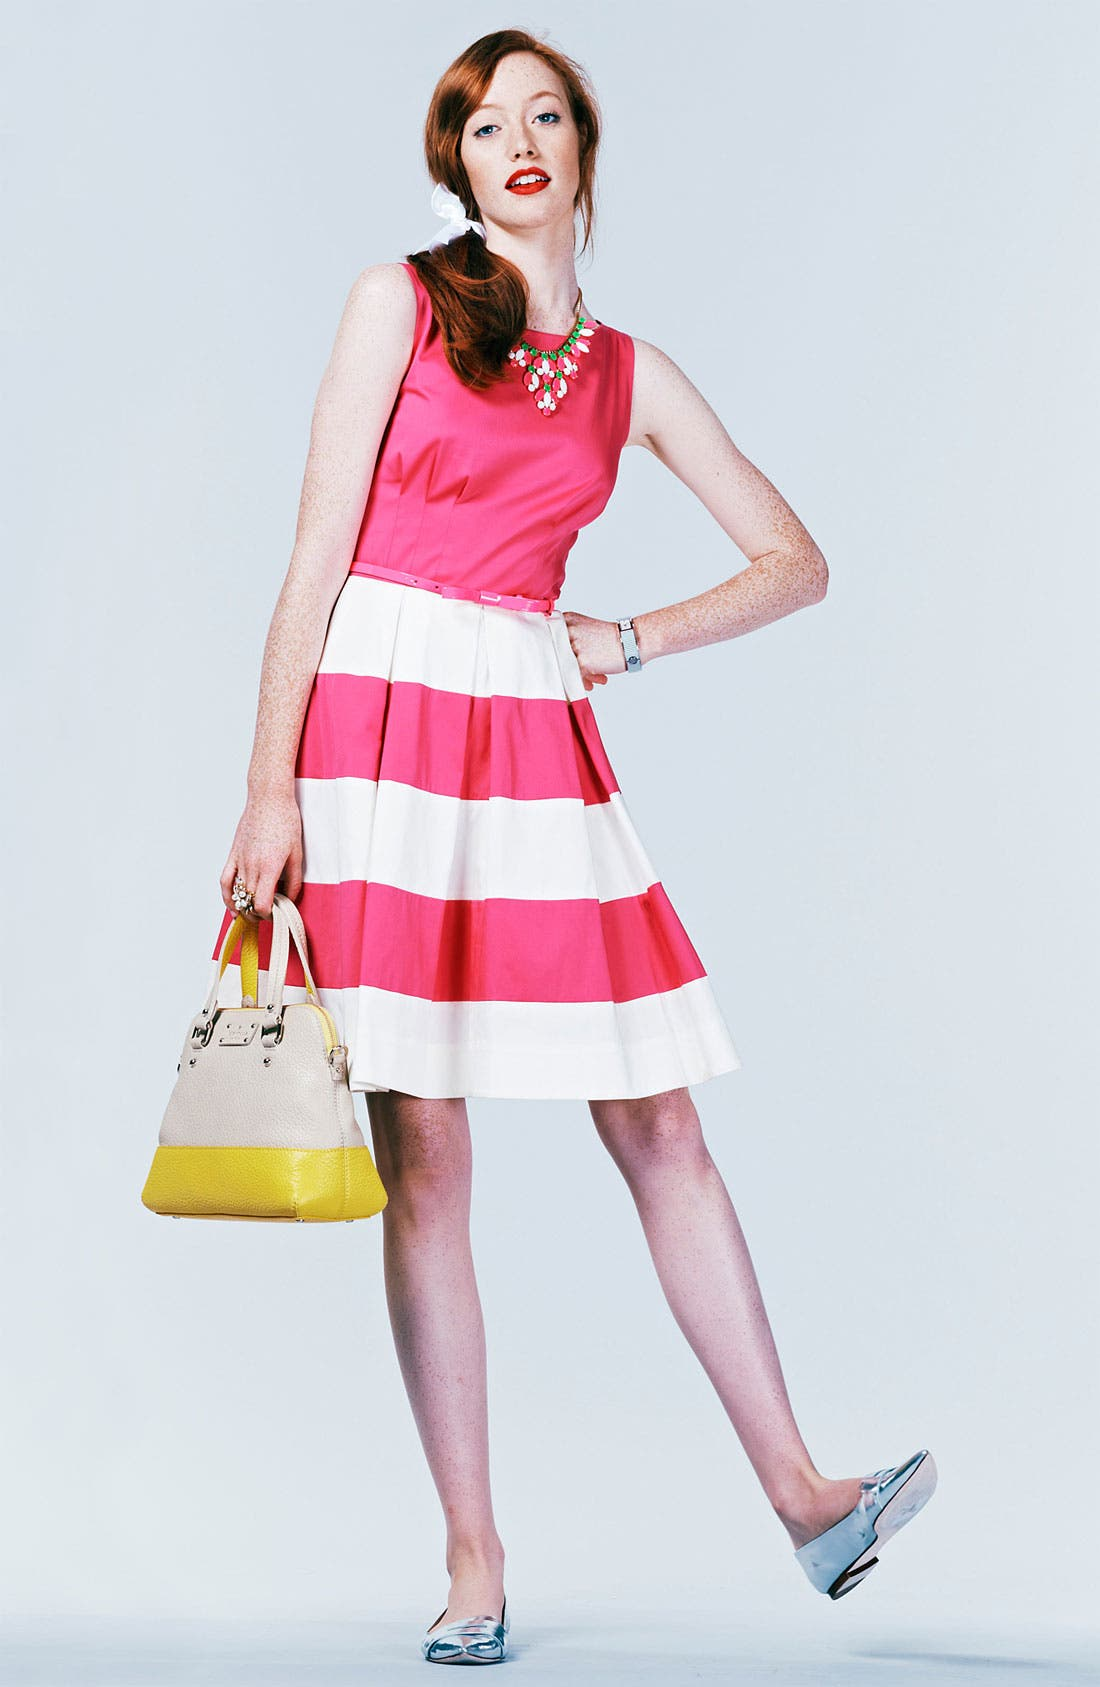 Alternate Image 1 Selected - kate spade new york dress & accessories